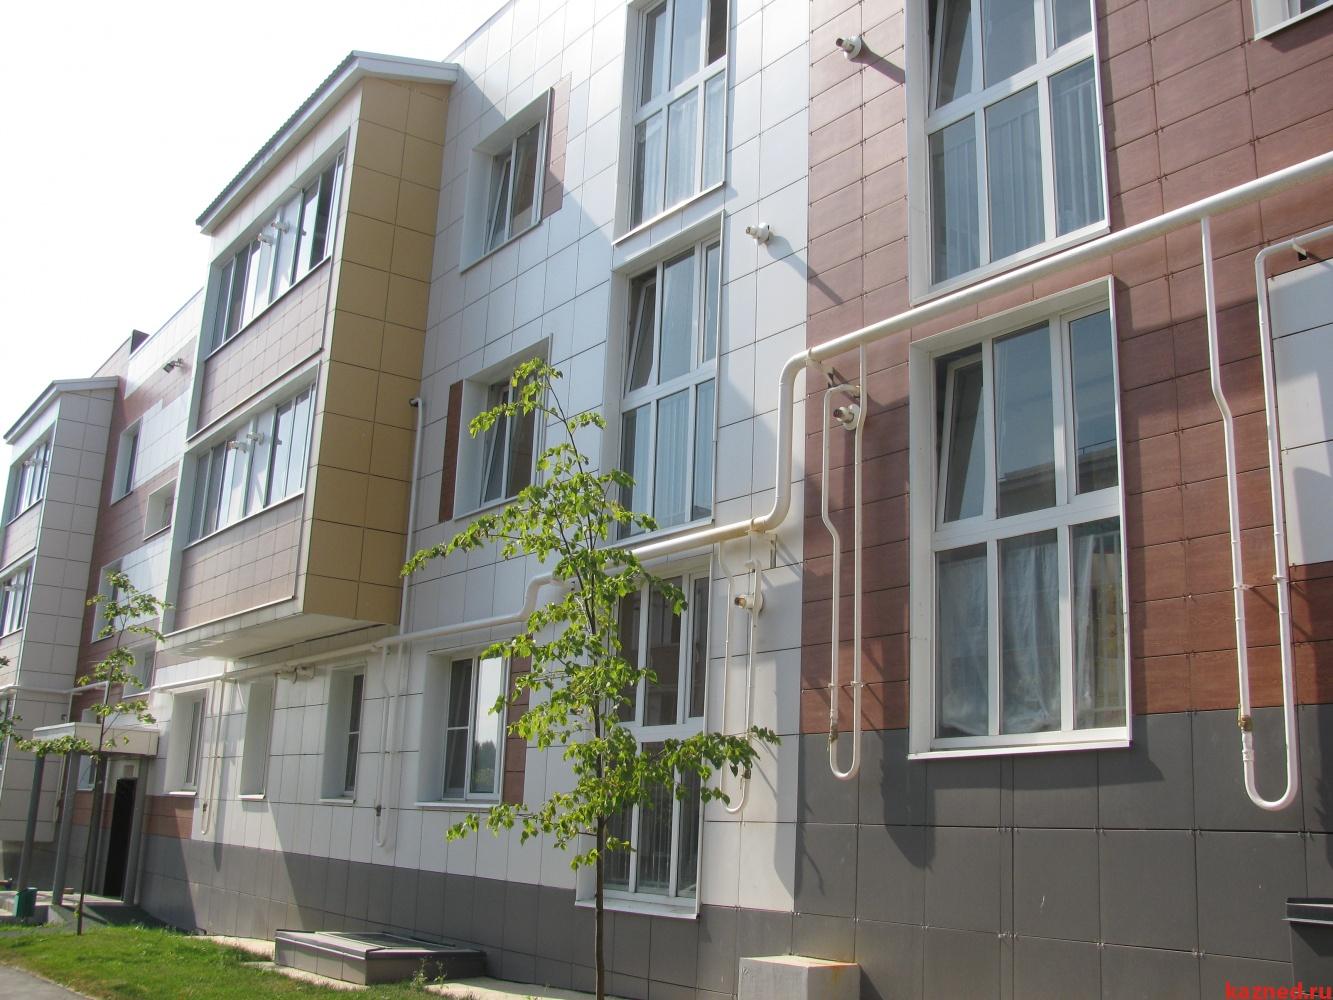 Царево, 34 кв.м. дом сдан квартира с евро ремонтом (миниатюра №16)